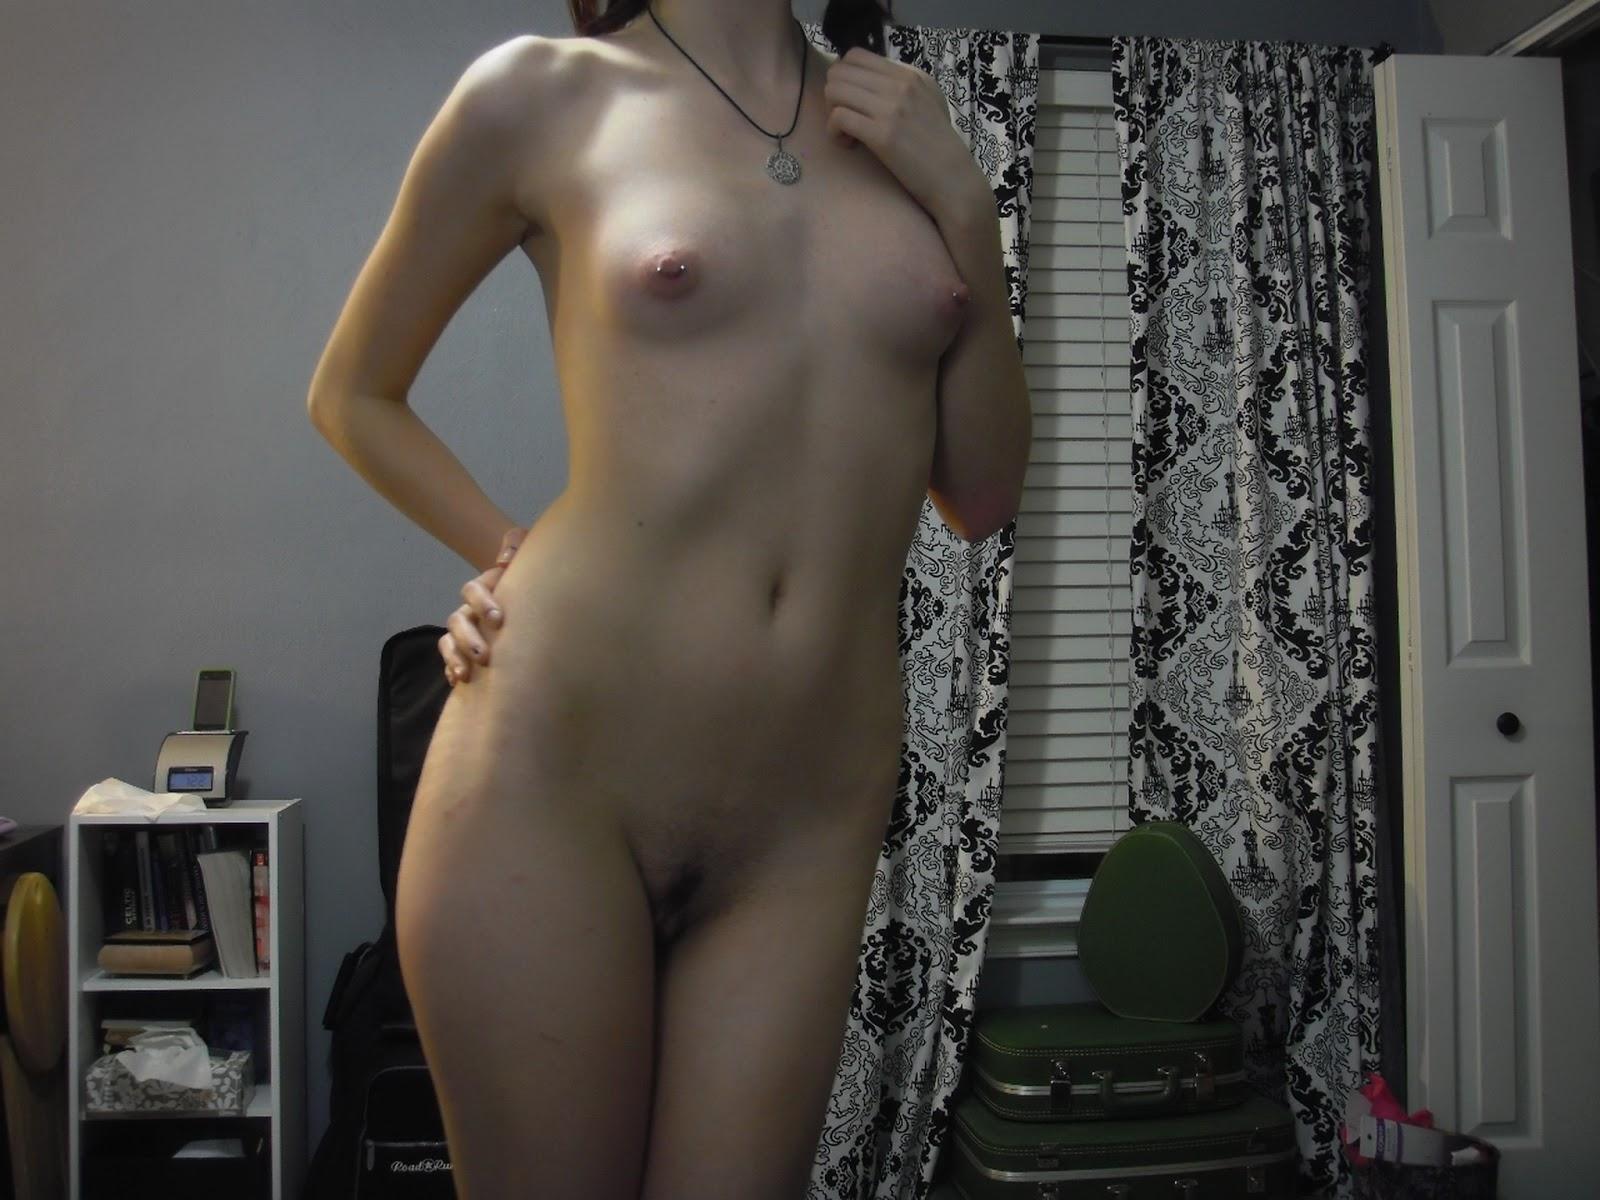 Голые Женщины Веб Камера Онлайн